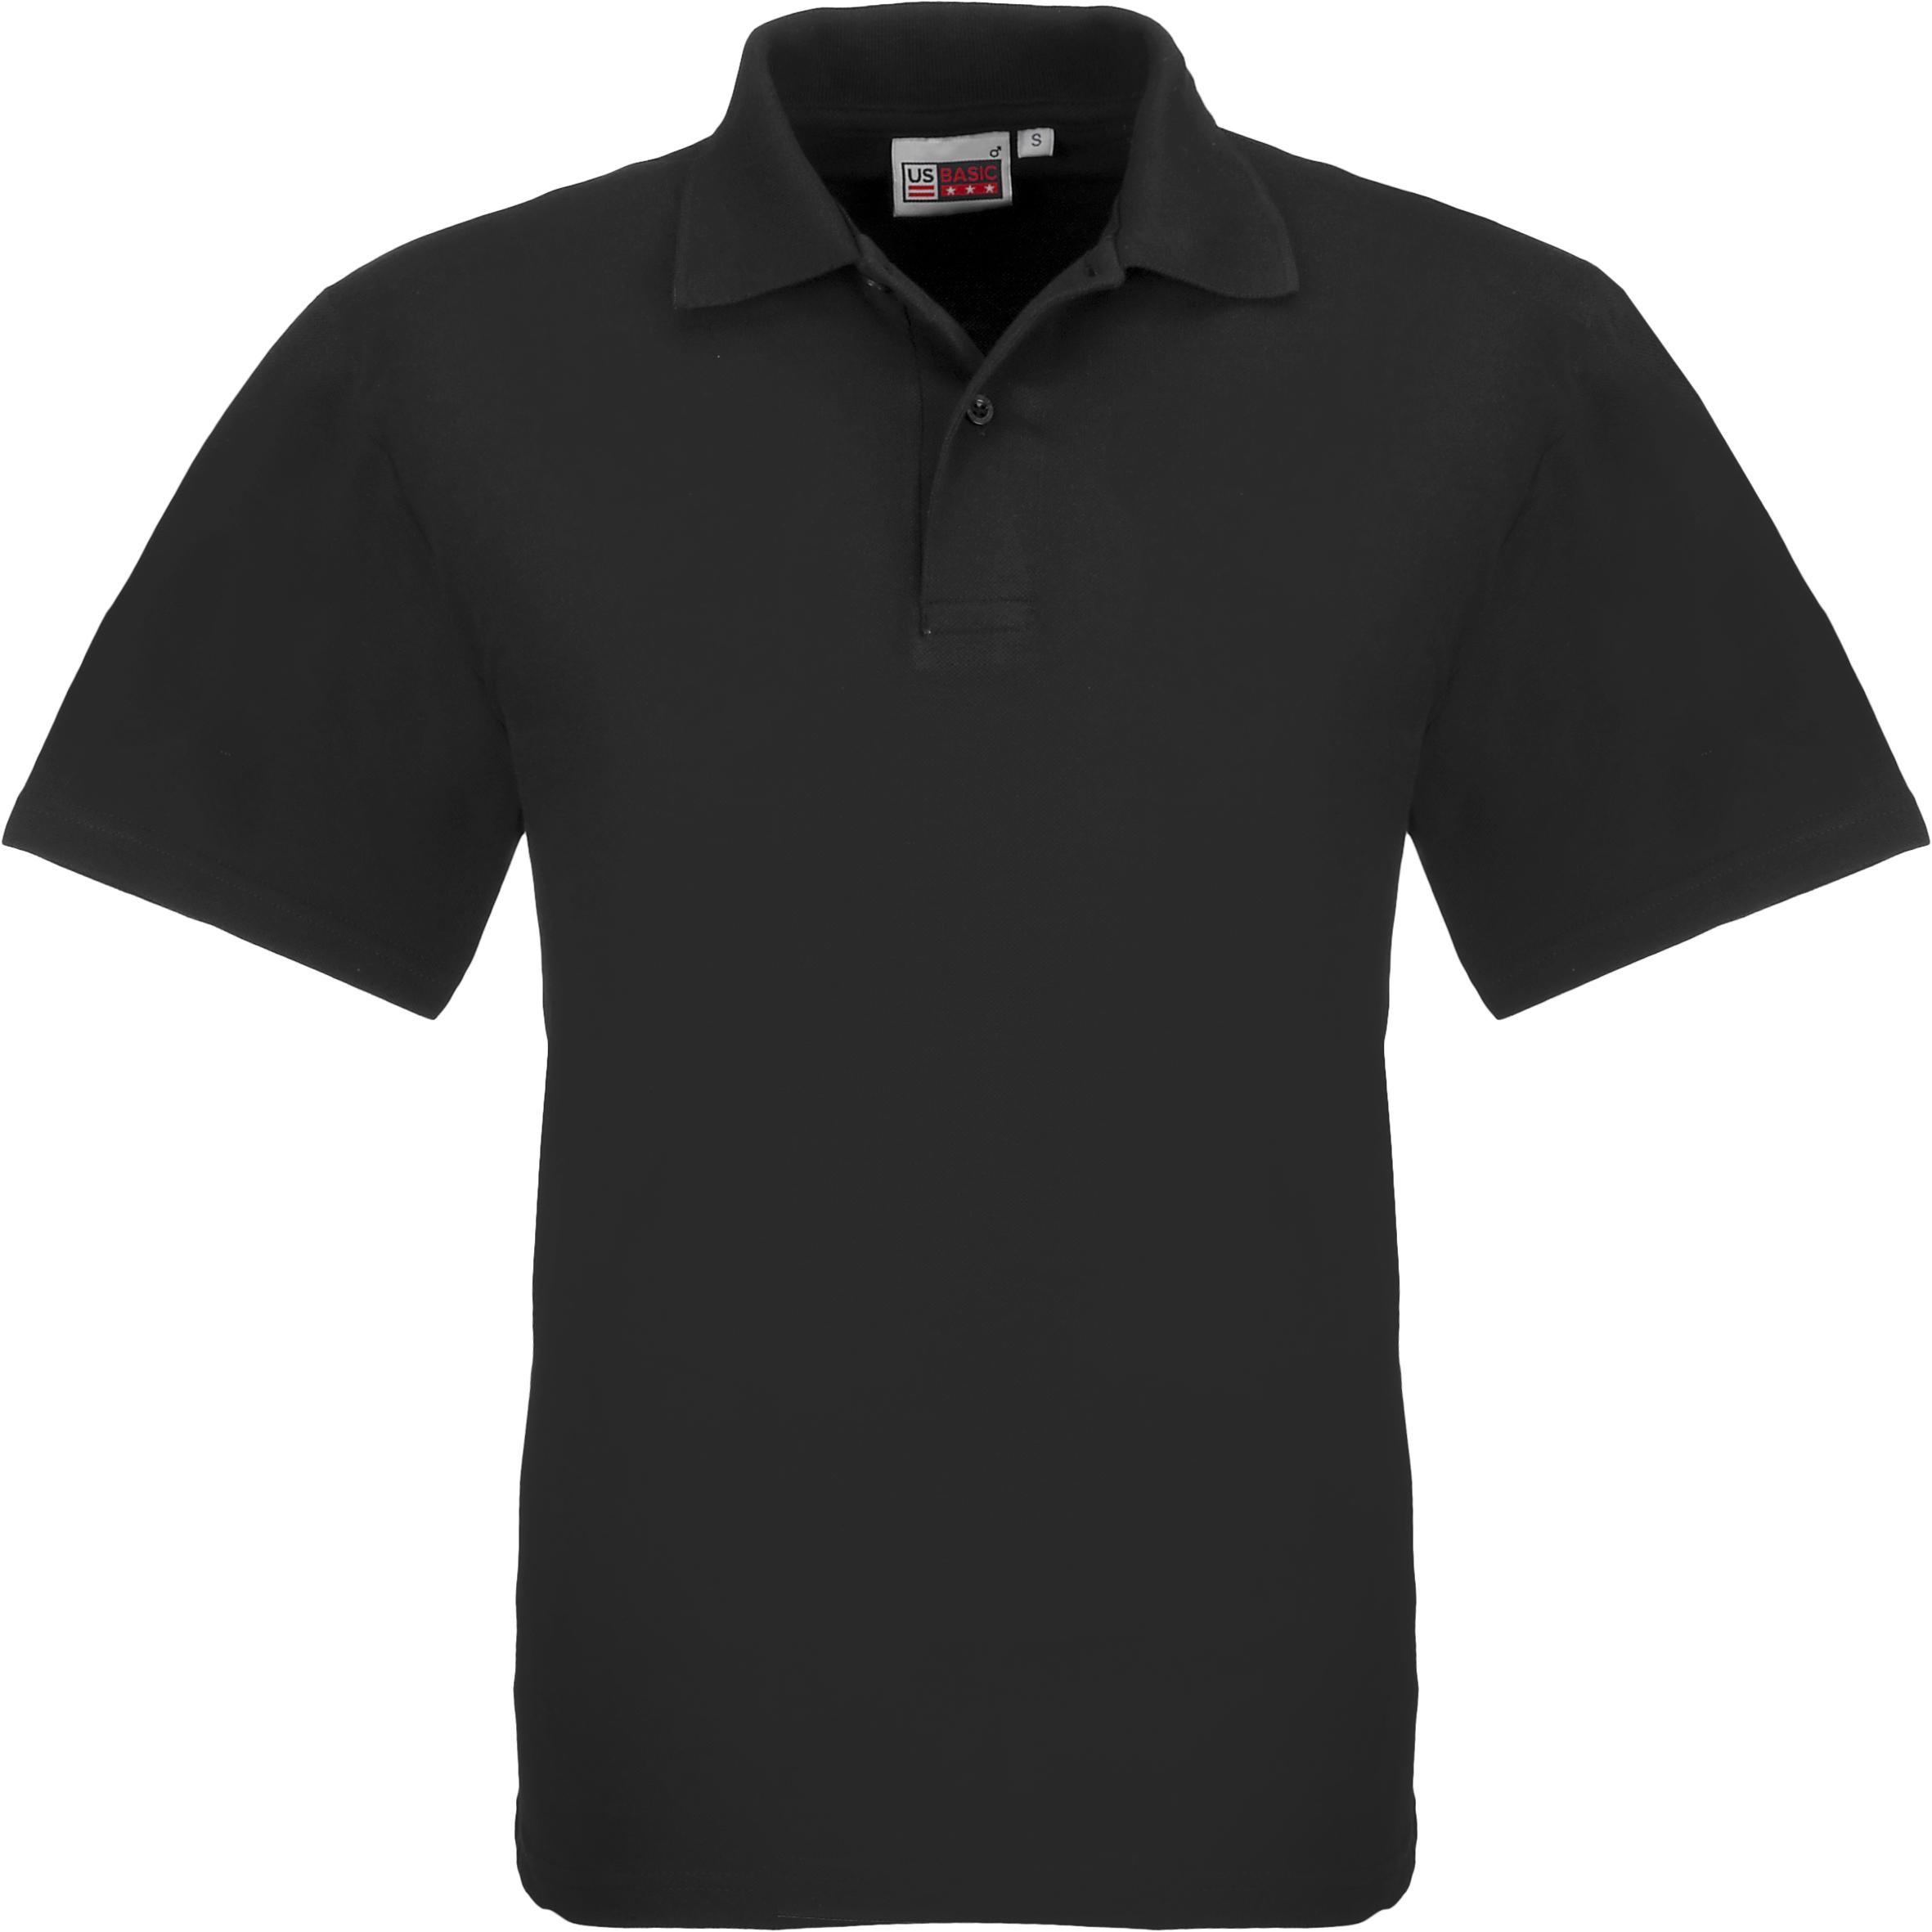 Kids Elemental Golf Shirt - Black Only